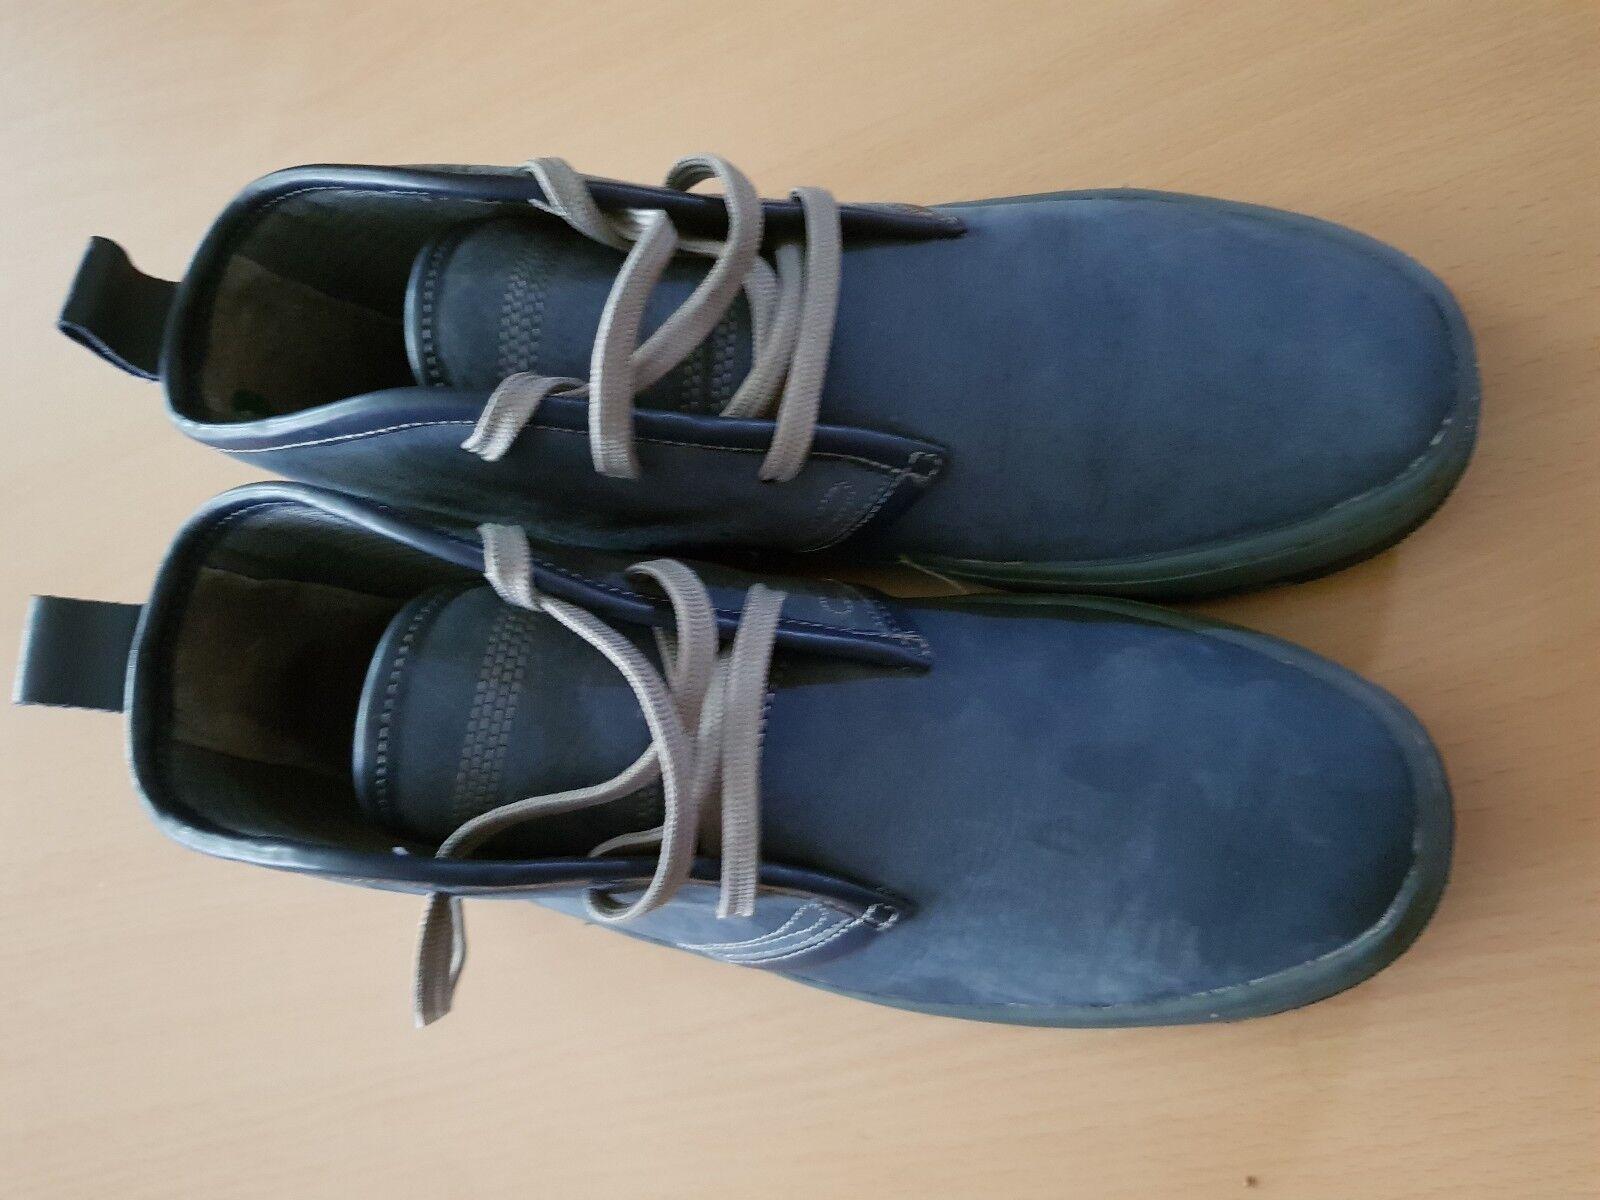 Woodland Herrenschuhe Schnürstiefel boots / blau Gr. 8 / 42 / boots 28 9a7ea3